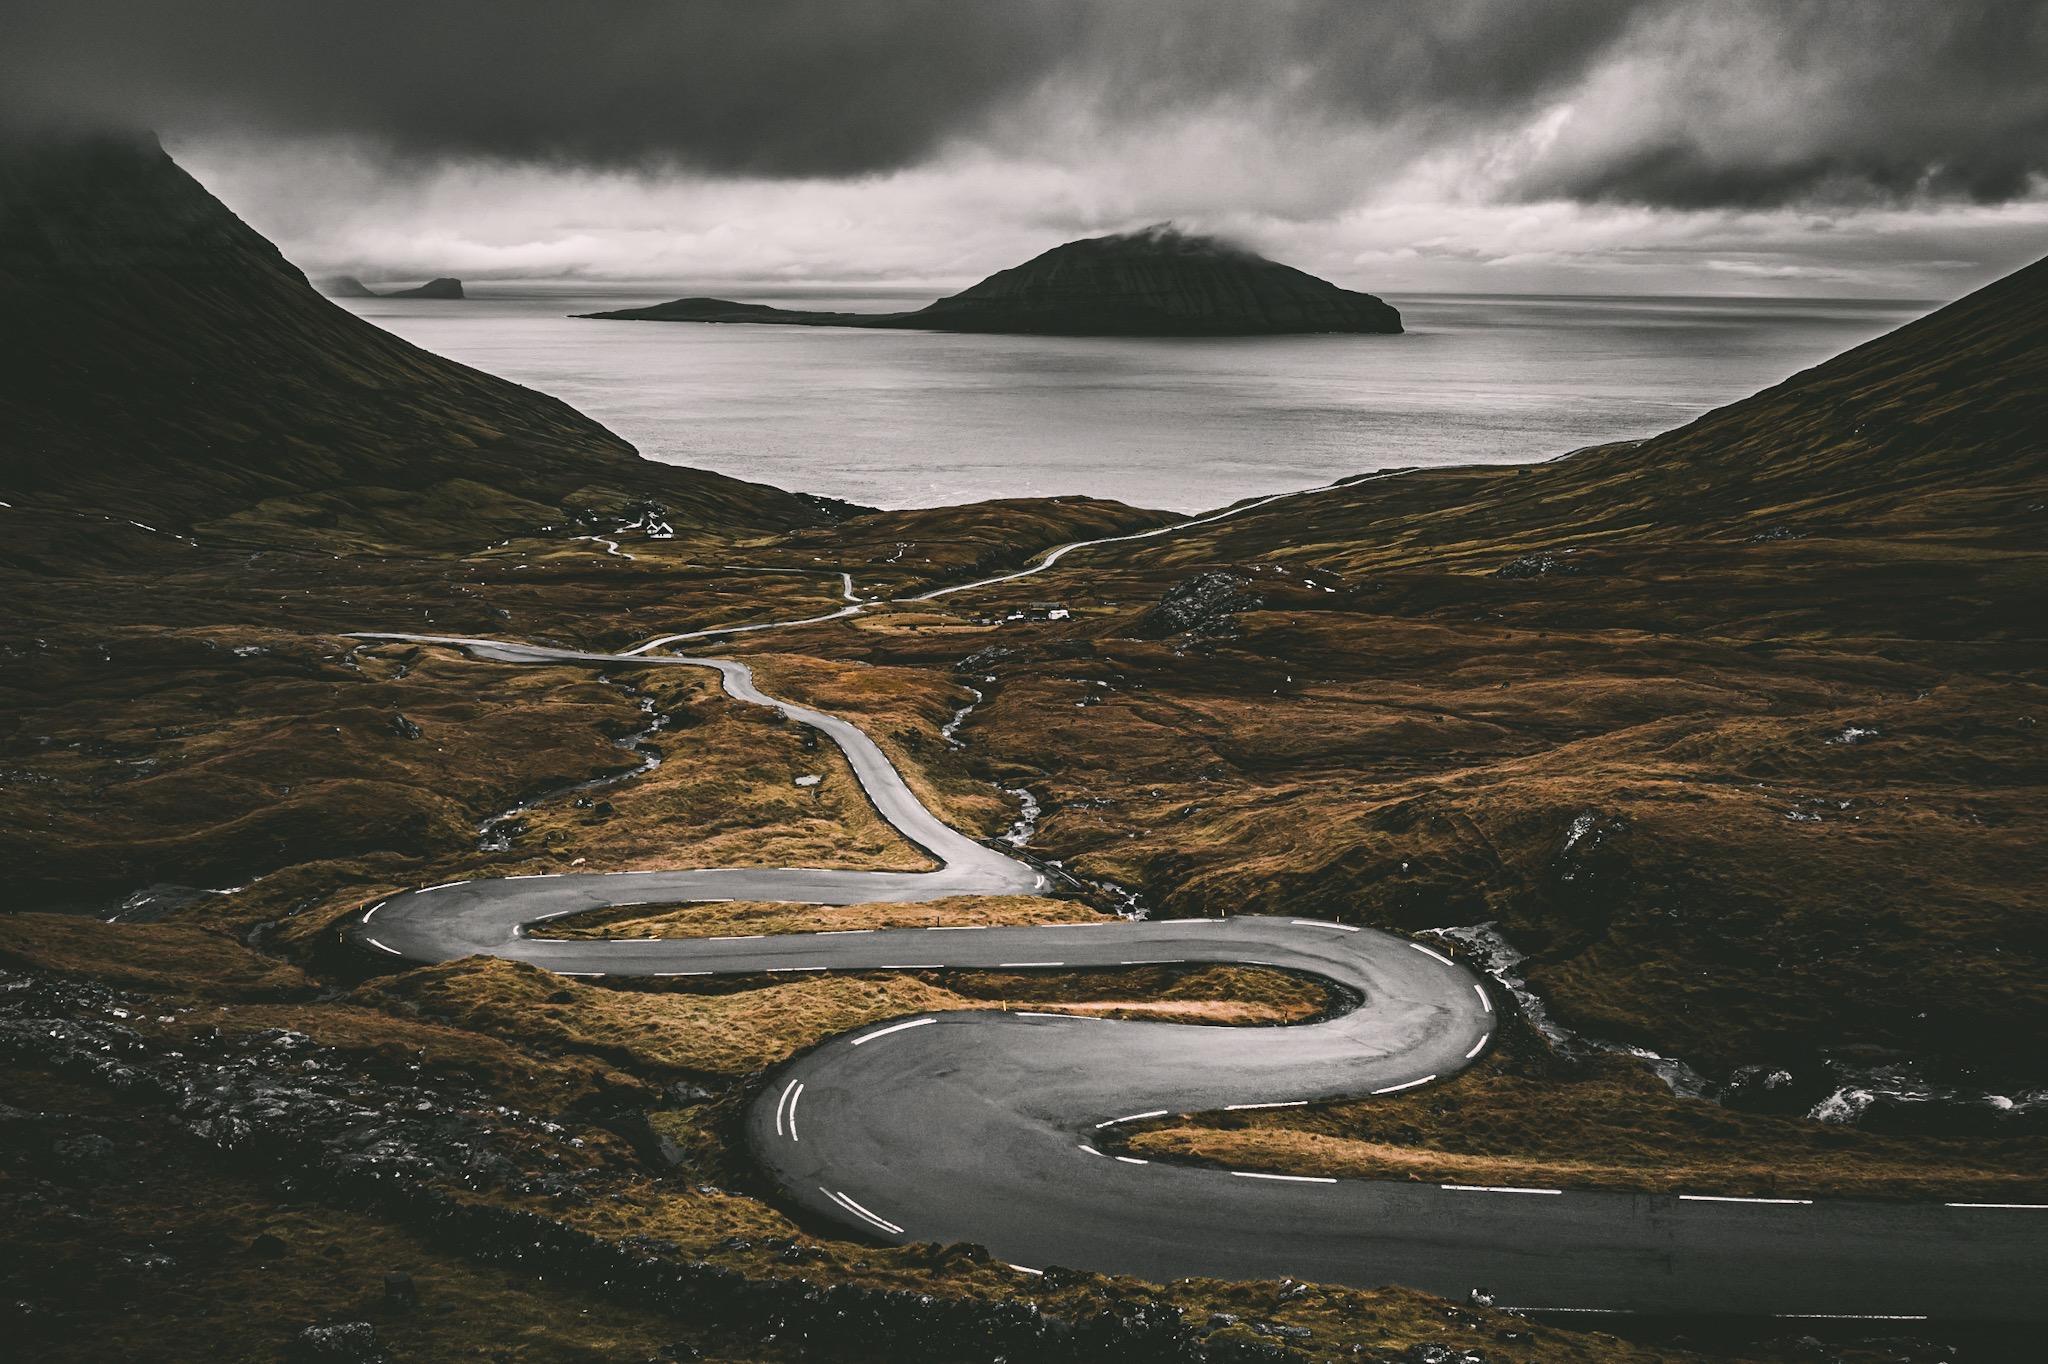 Drohnenaufnahme_dji_landscpae_paltenghi_claudio_photography32 🇫🇴Faroeisland Road Trip🇫🇴 Blog Landscape